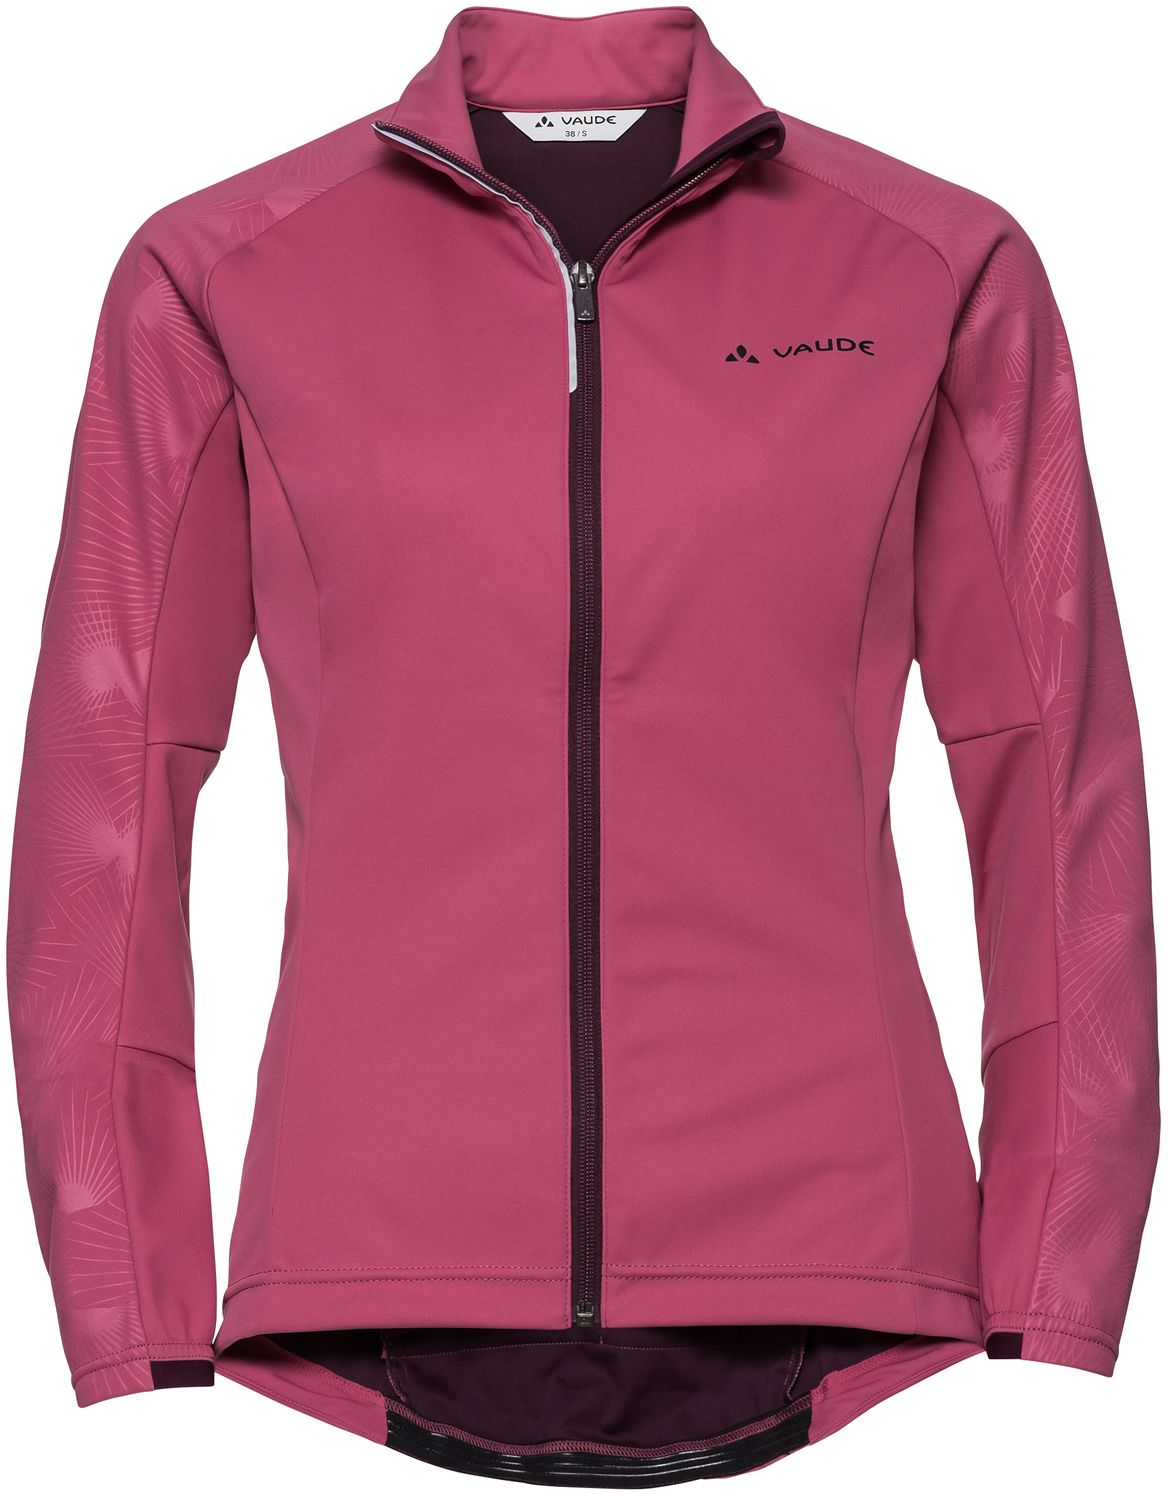 Vaude Women's Resca Light Softshell Jacket - grape 38